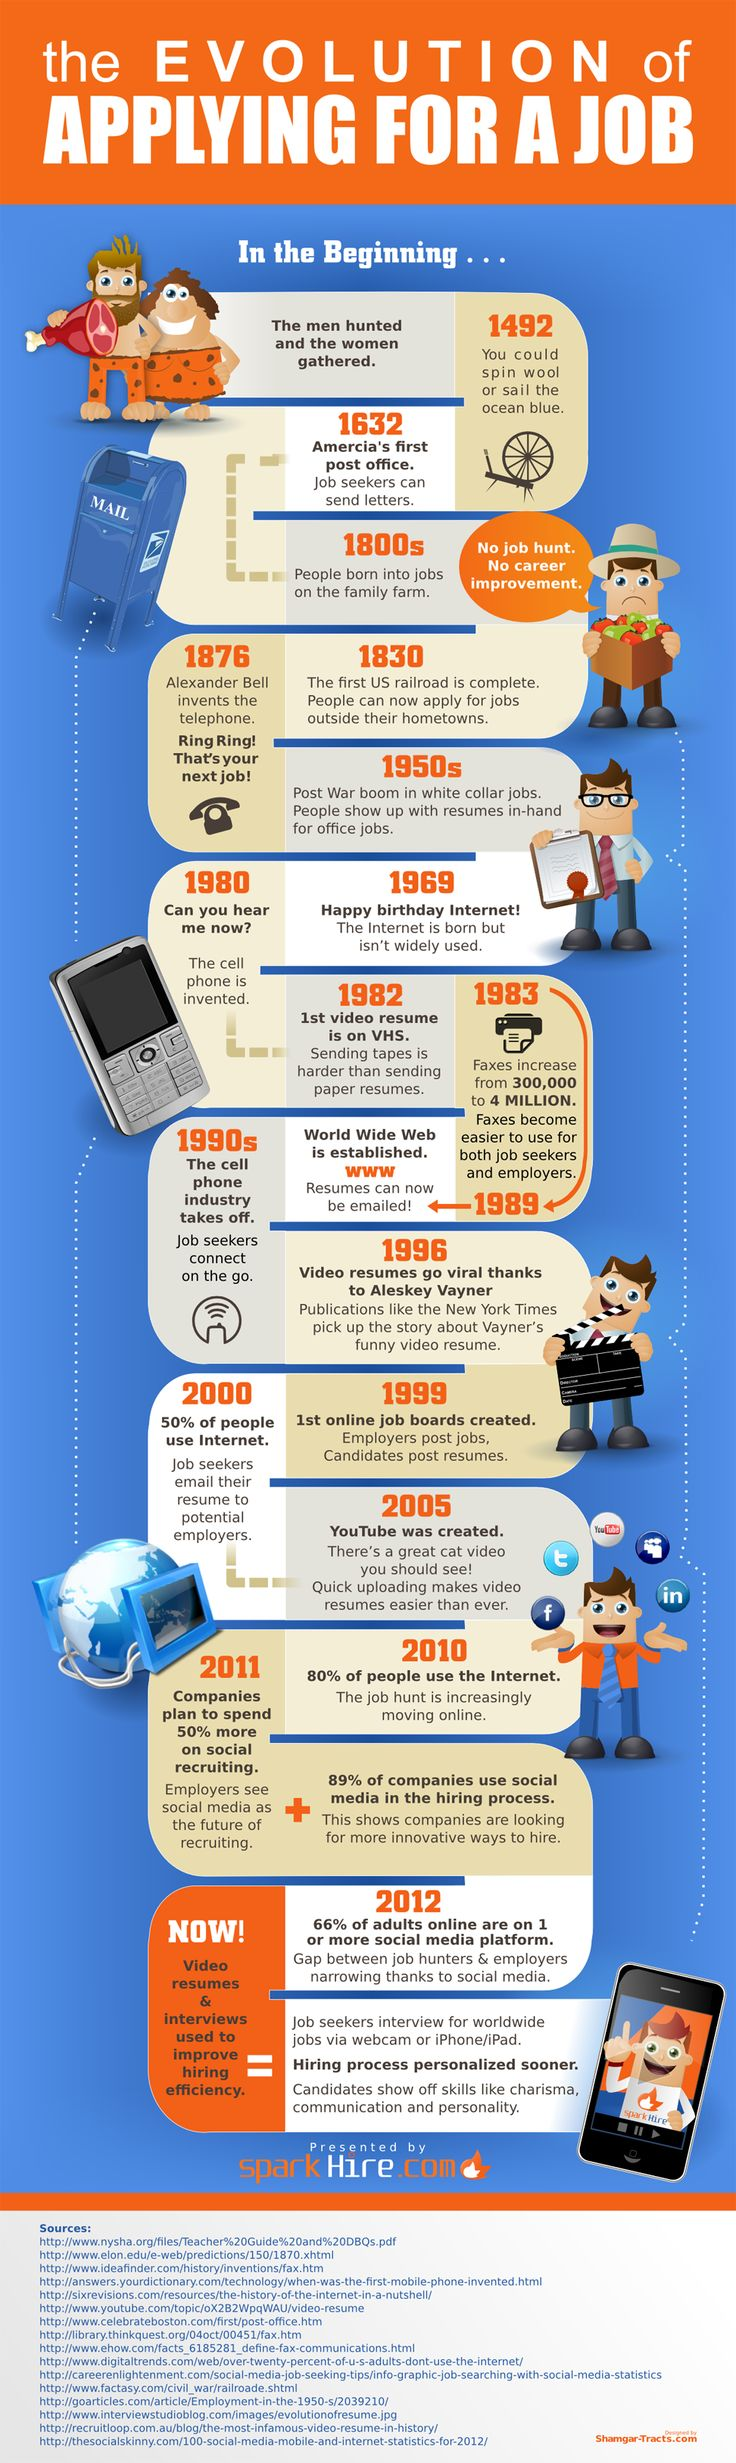 Evolution of Applying for a Job